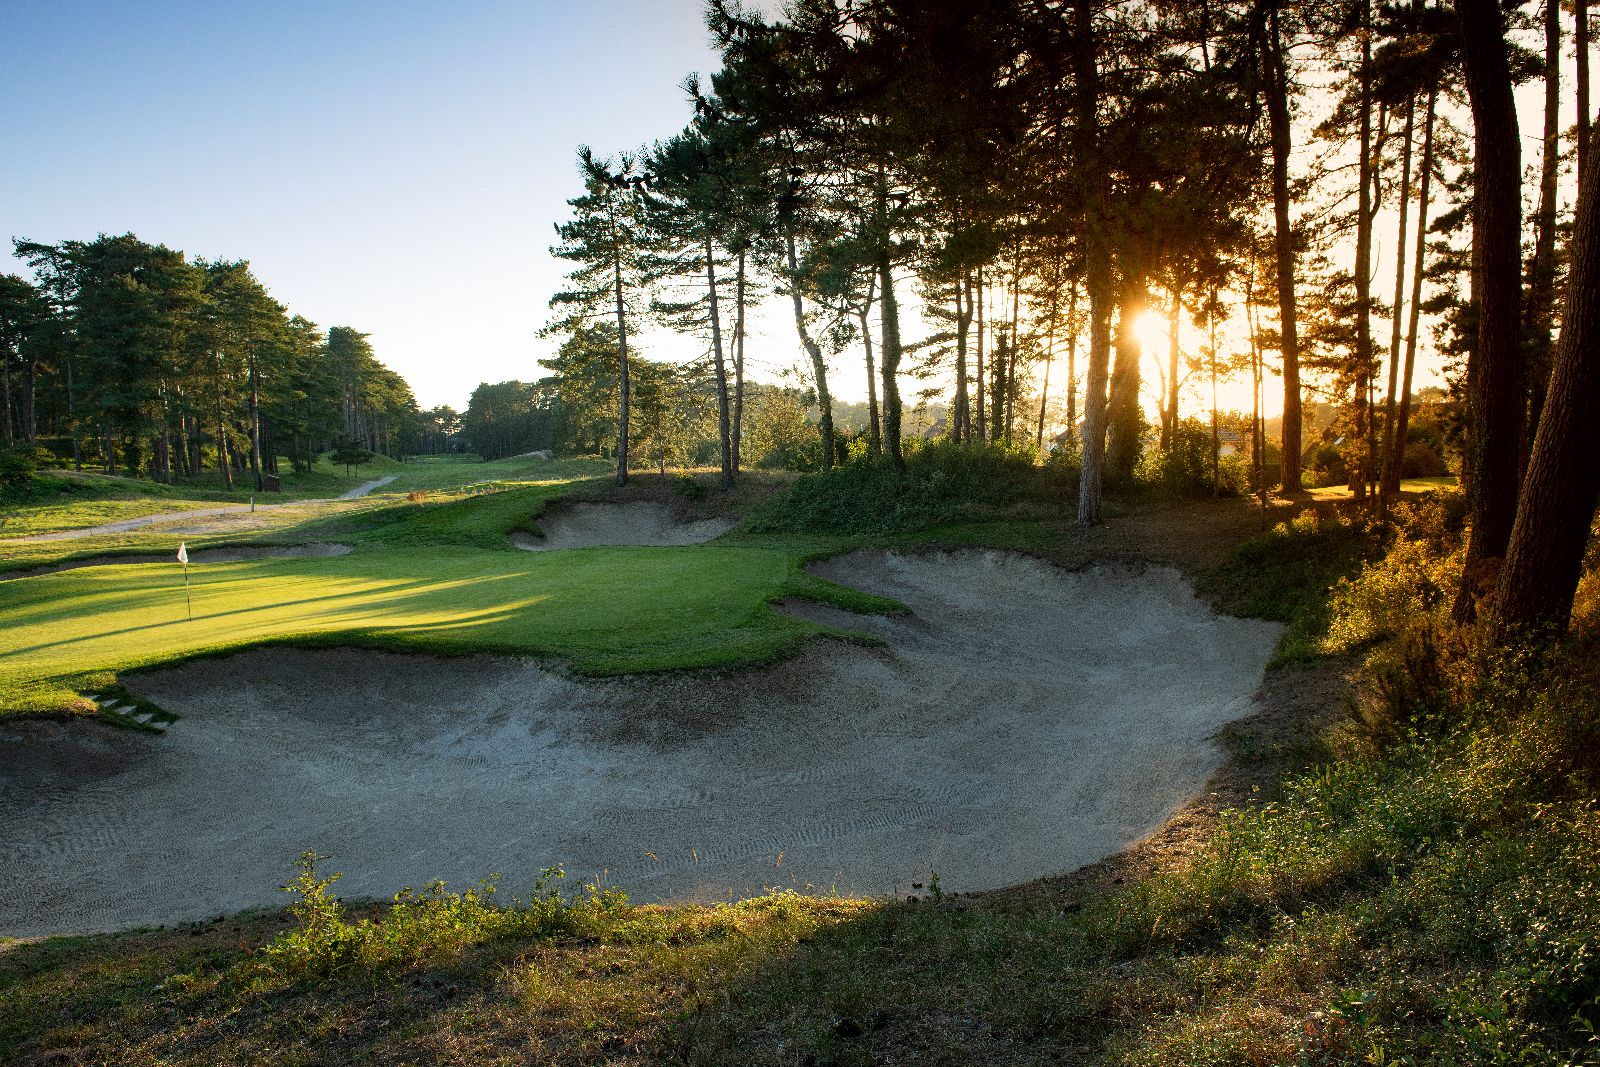 golf-expedition-golf-reizen-frankrijk-regio-pas-de-calais-le-manoir-hotel-golfbaan.jpg